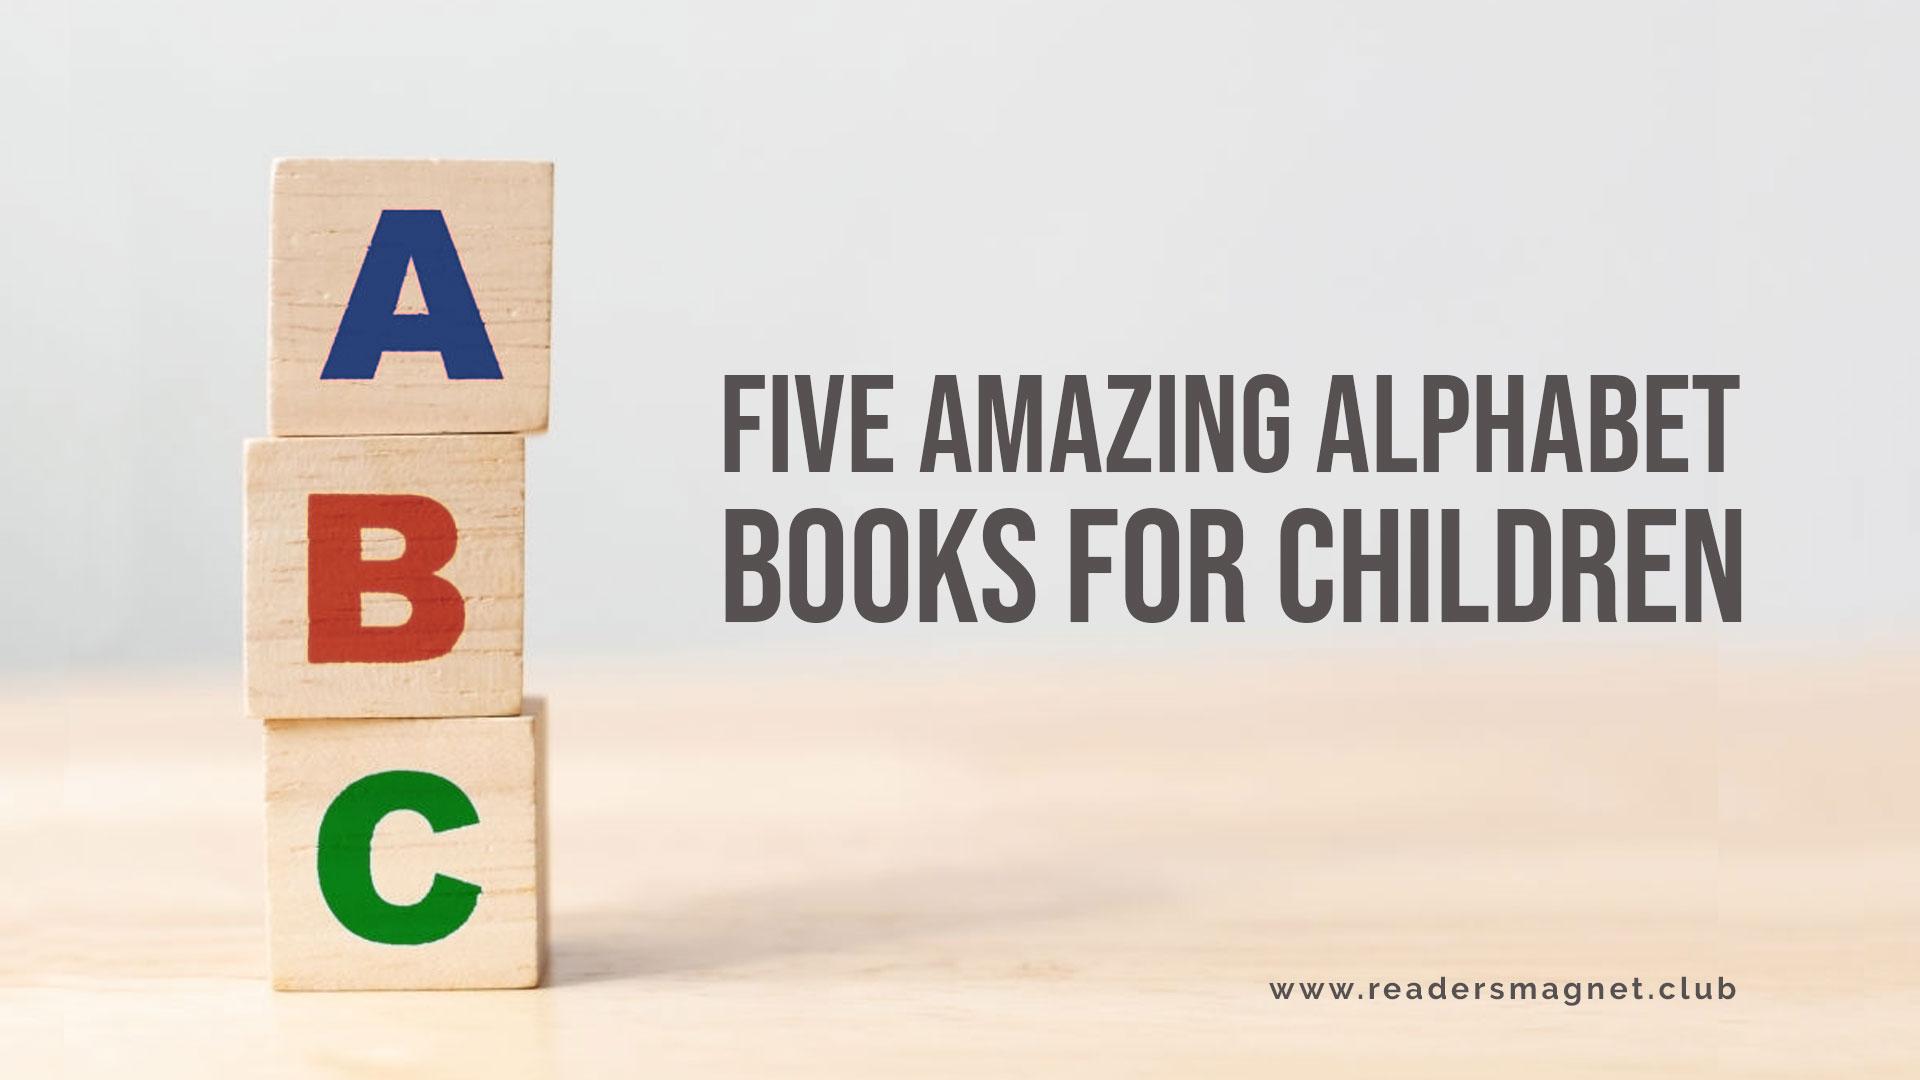 Five-Amazing-Alphabet-Books-For-Children banner